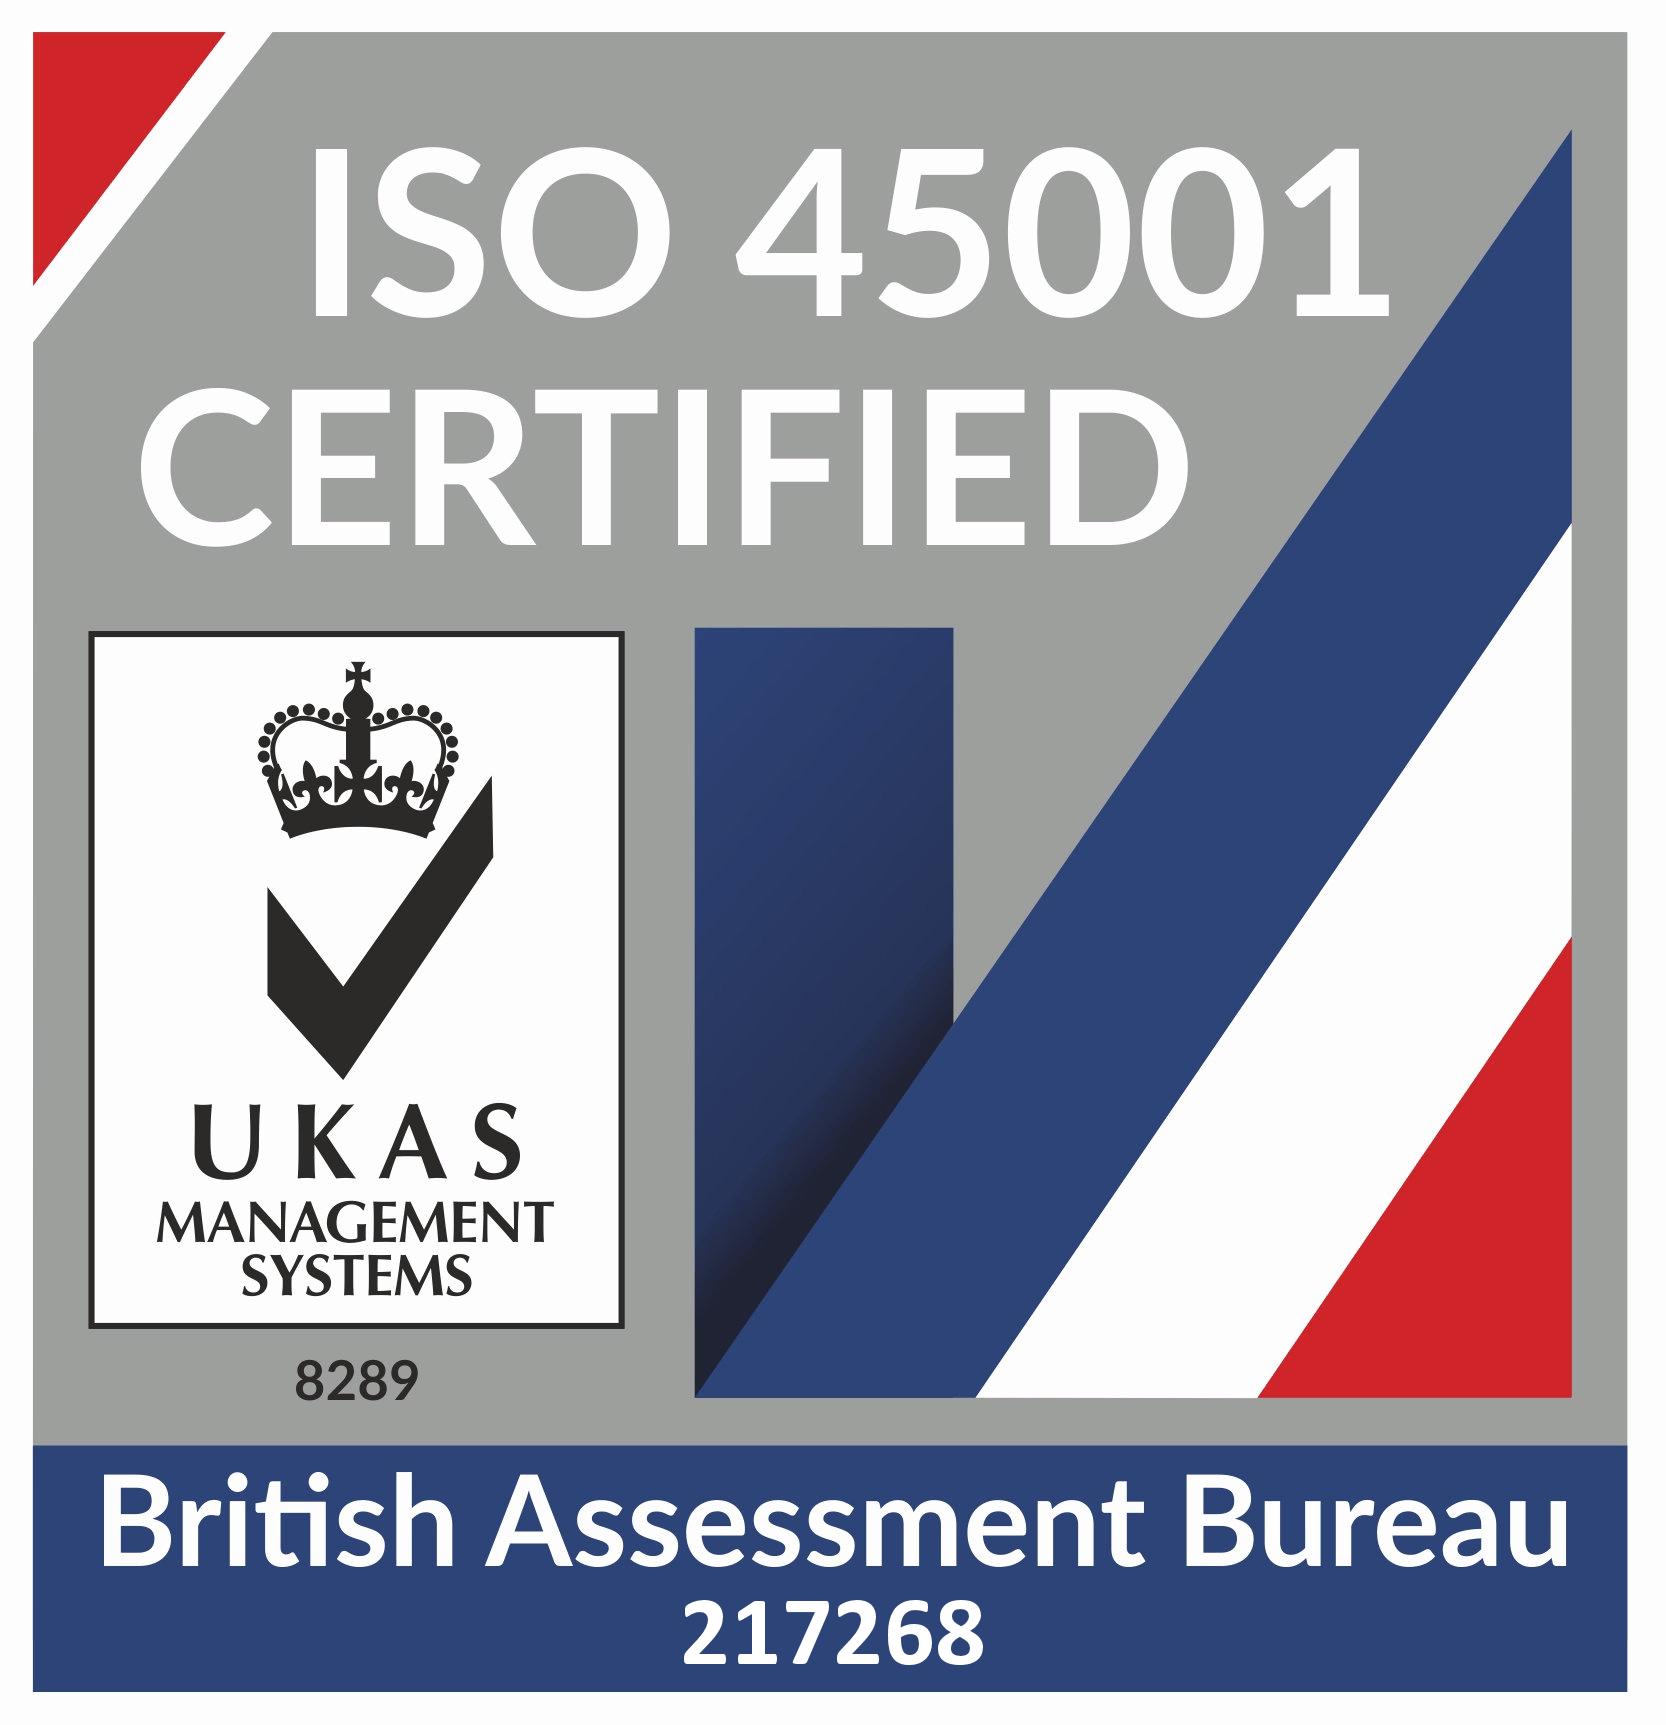 UKAS-ISO-45001-217268-certified